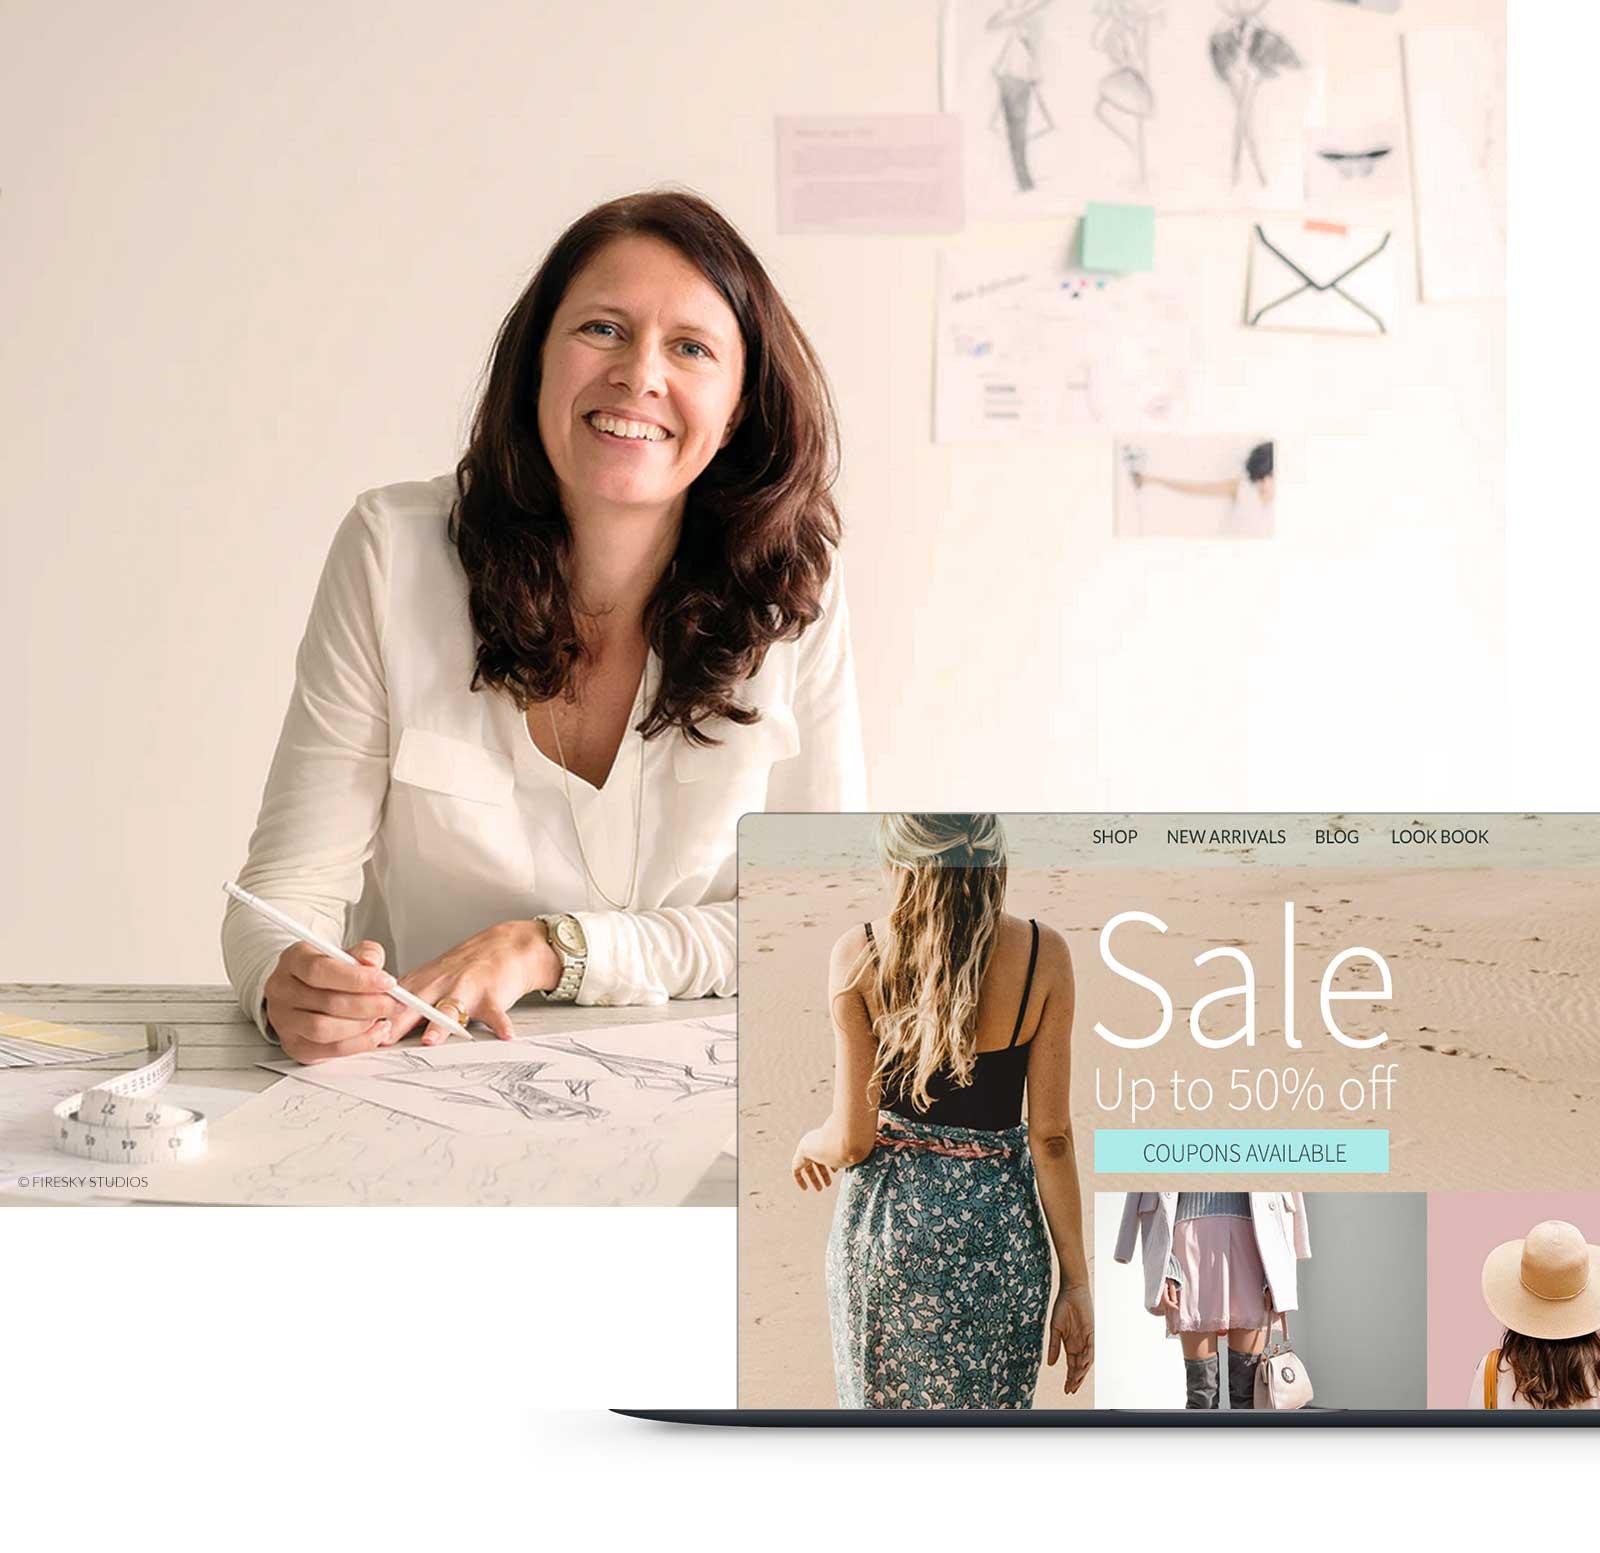 Fashion Design Showcasing Her Online Shop